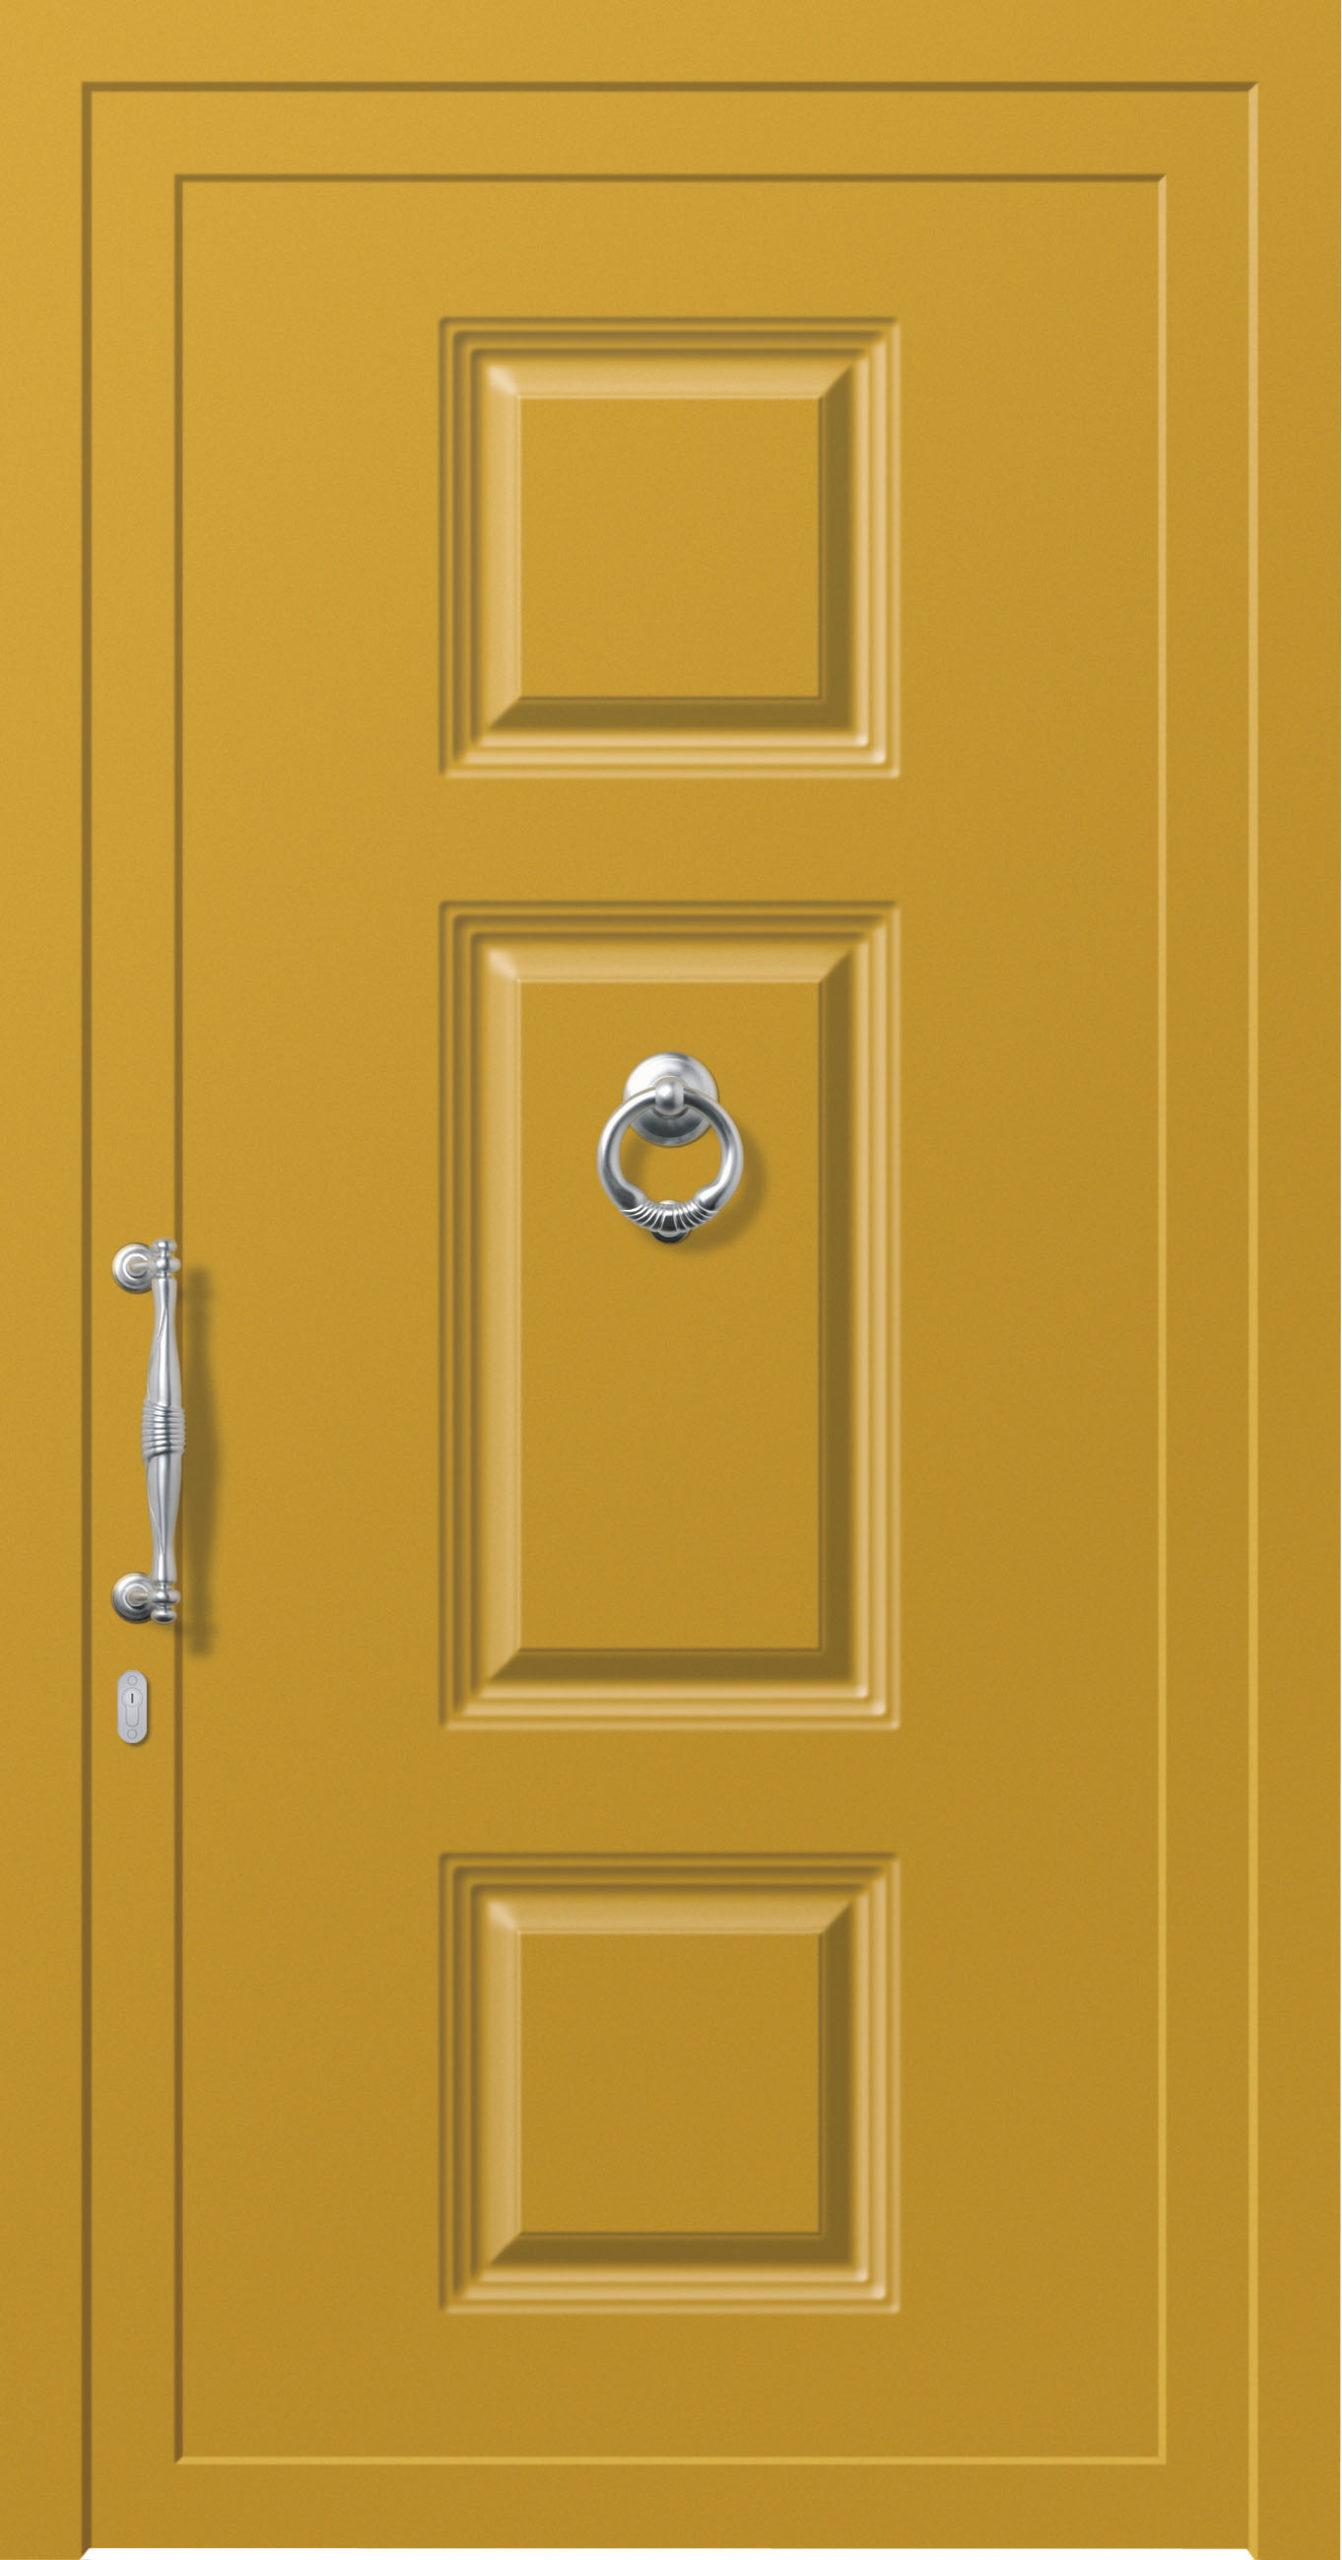 Entry Doors Linea Classica 81